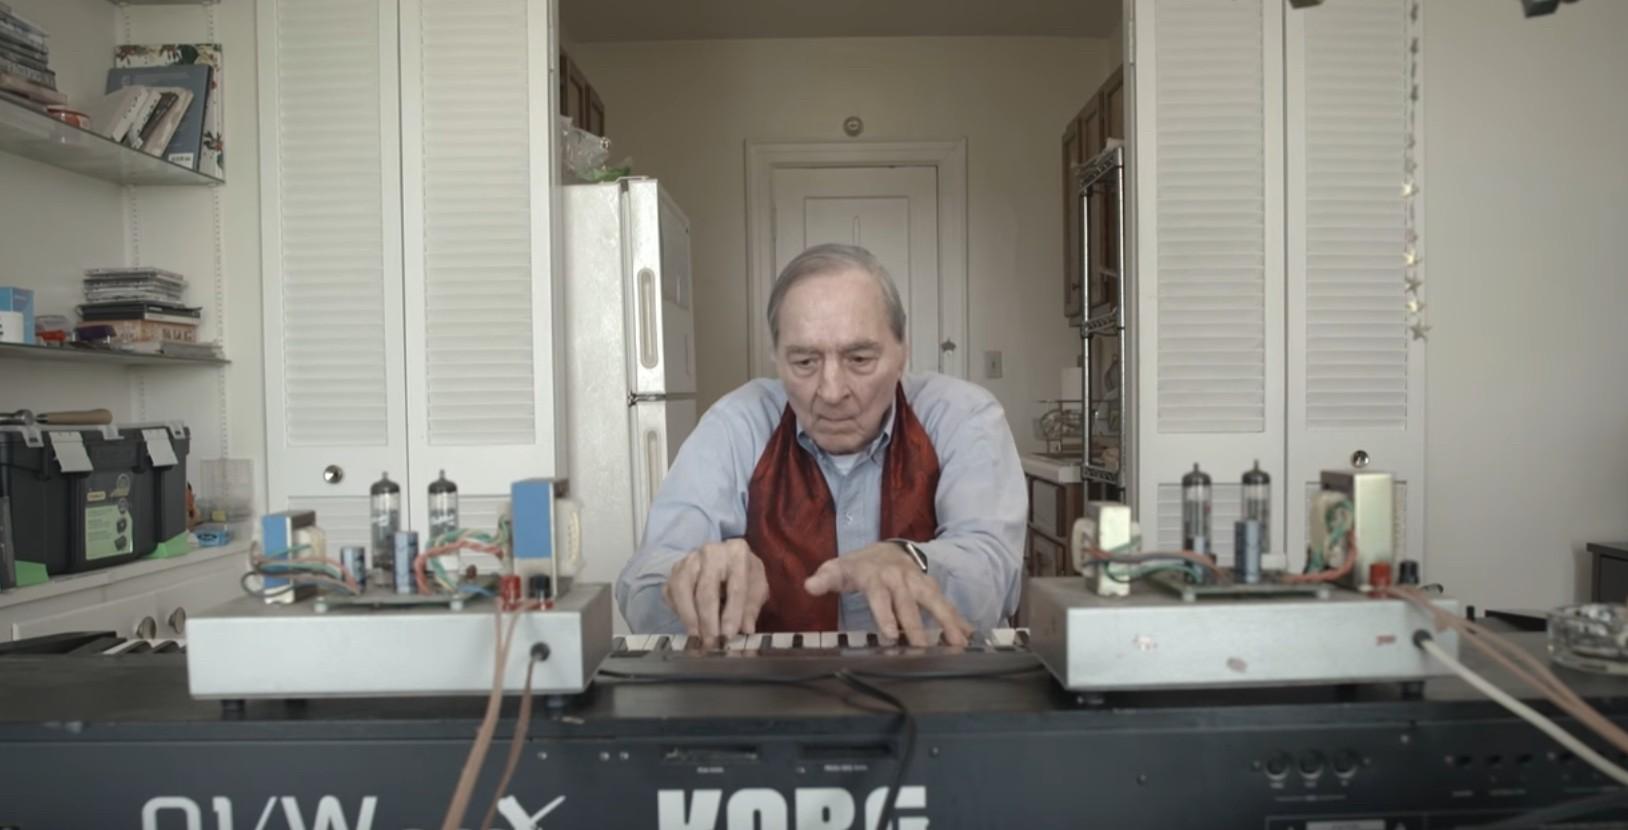 Acclaimed photographer William Eggleston has a new instrumental album made using an 88-key Korg synthesizer.